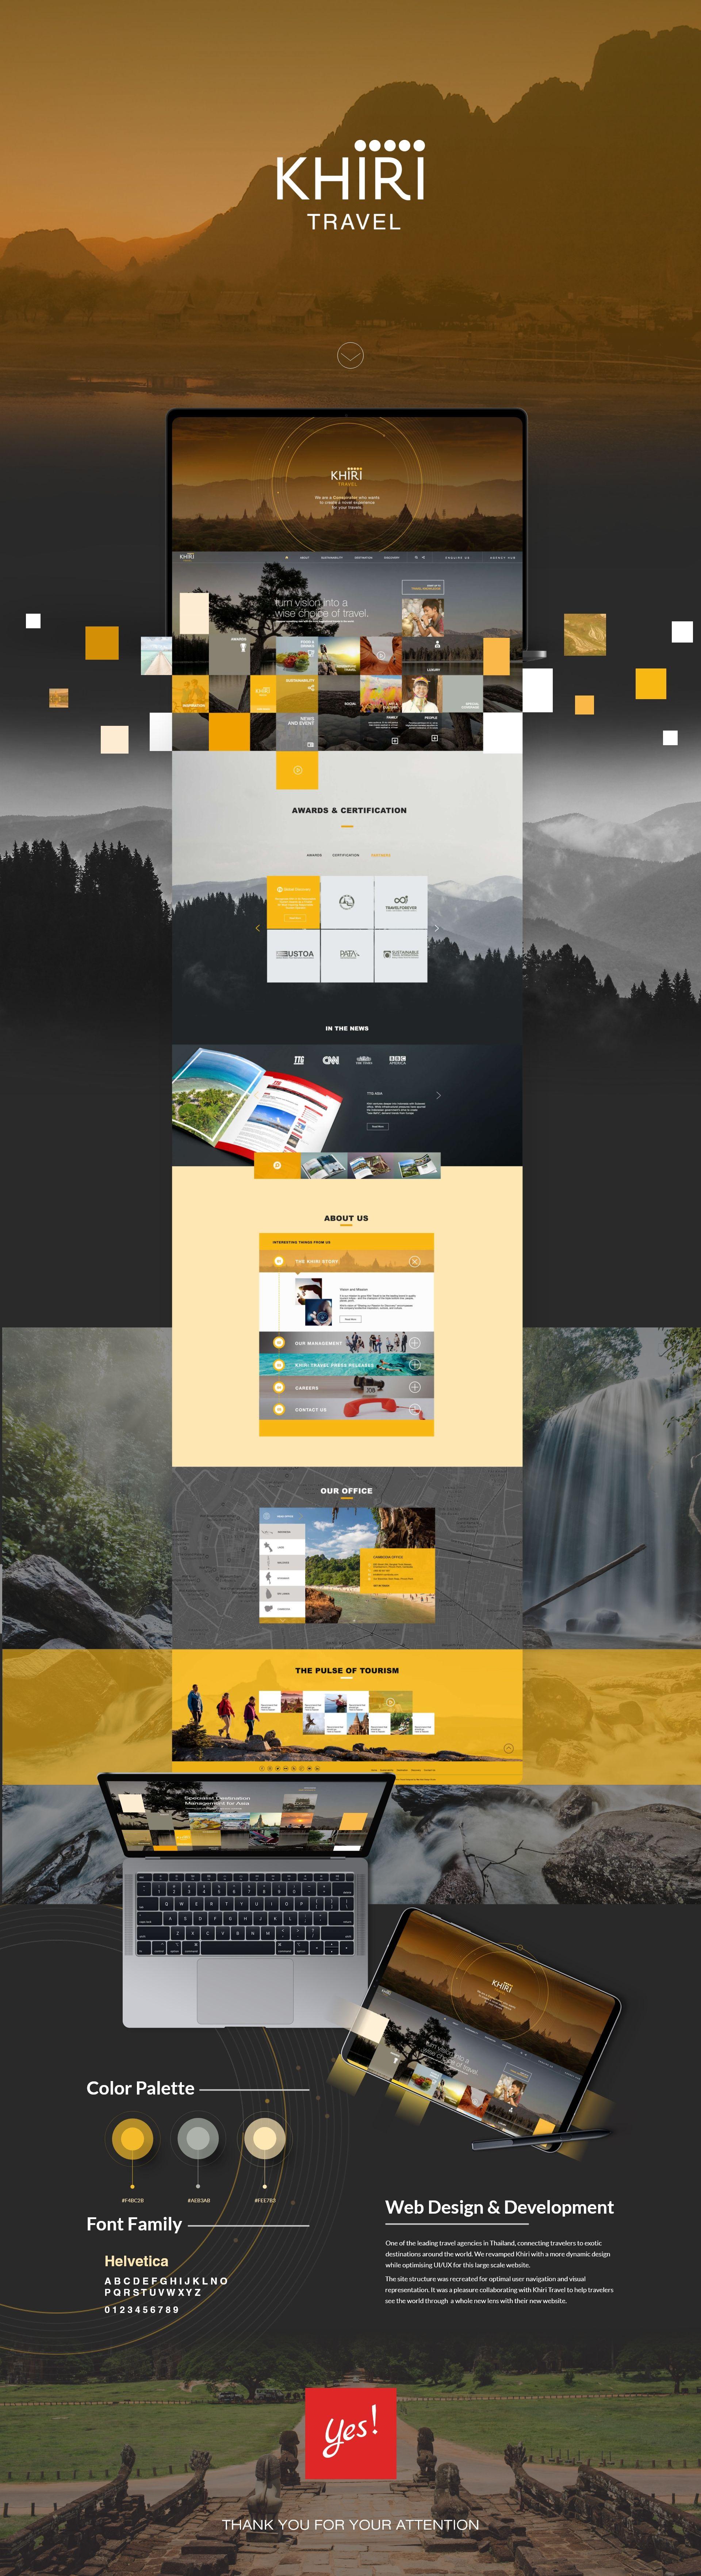 Khiri Travel Web Design Web Development Design Web Design Studio